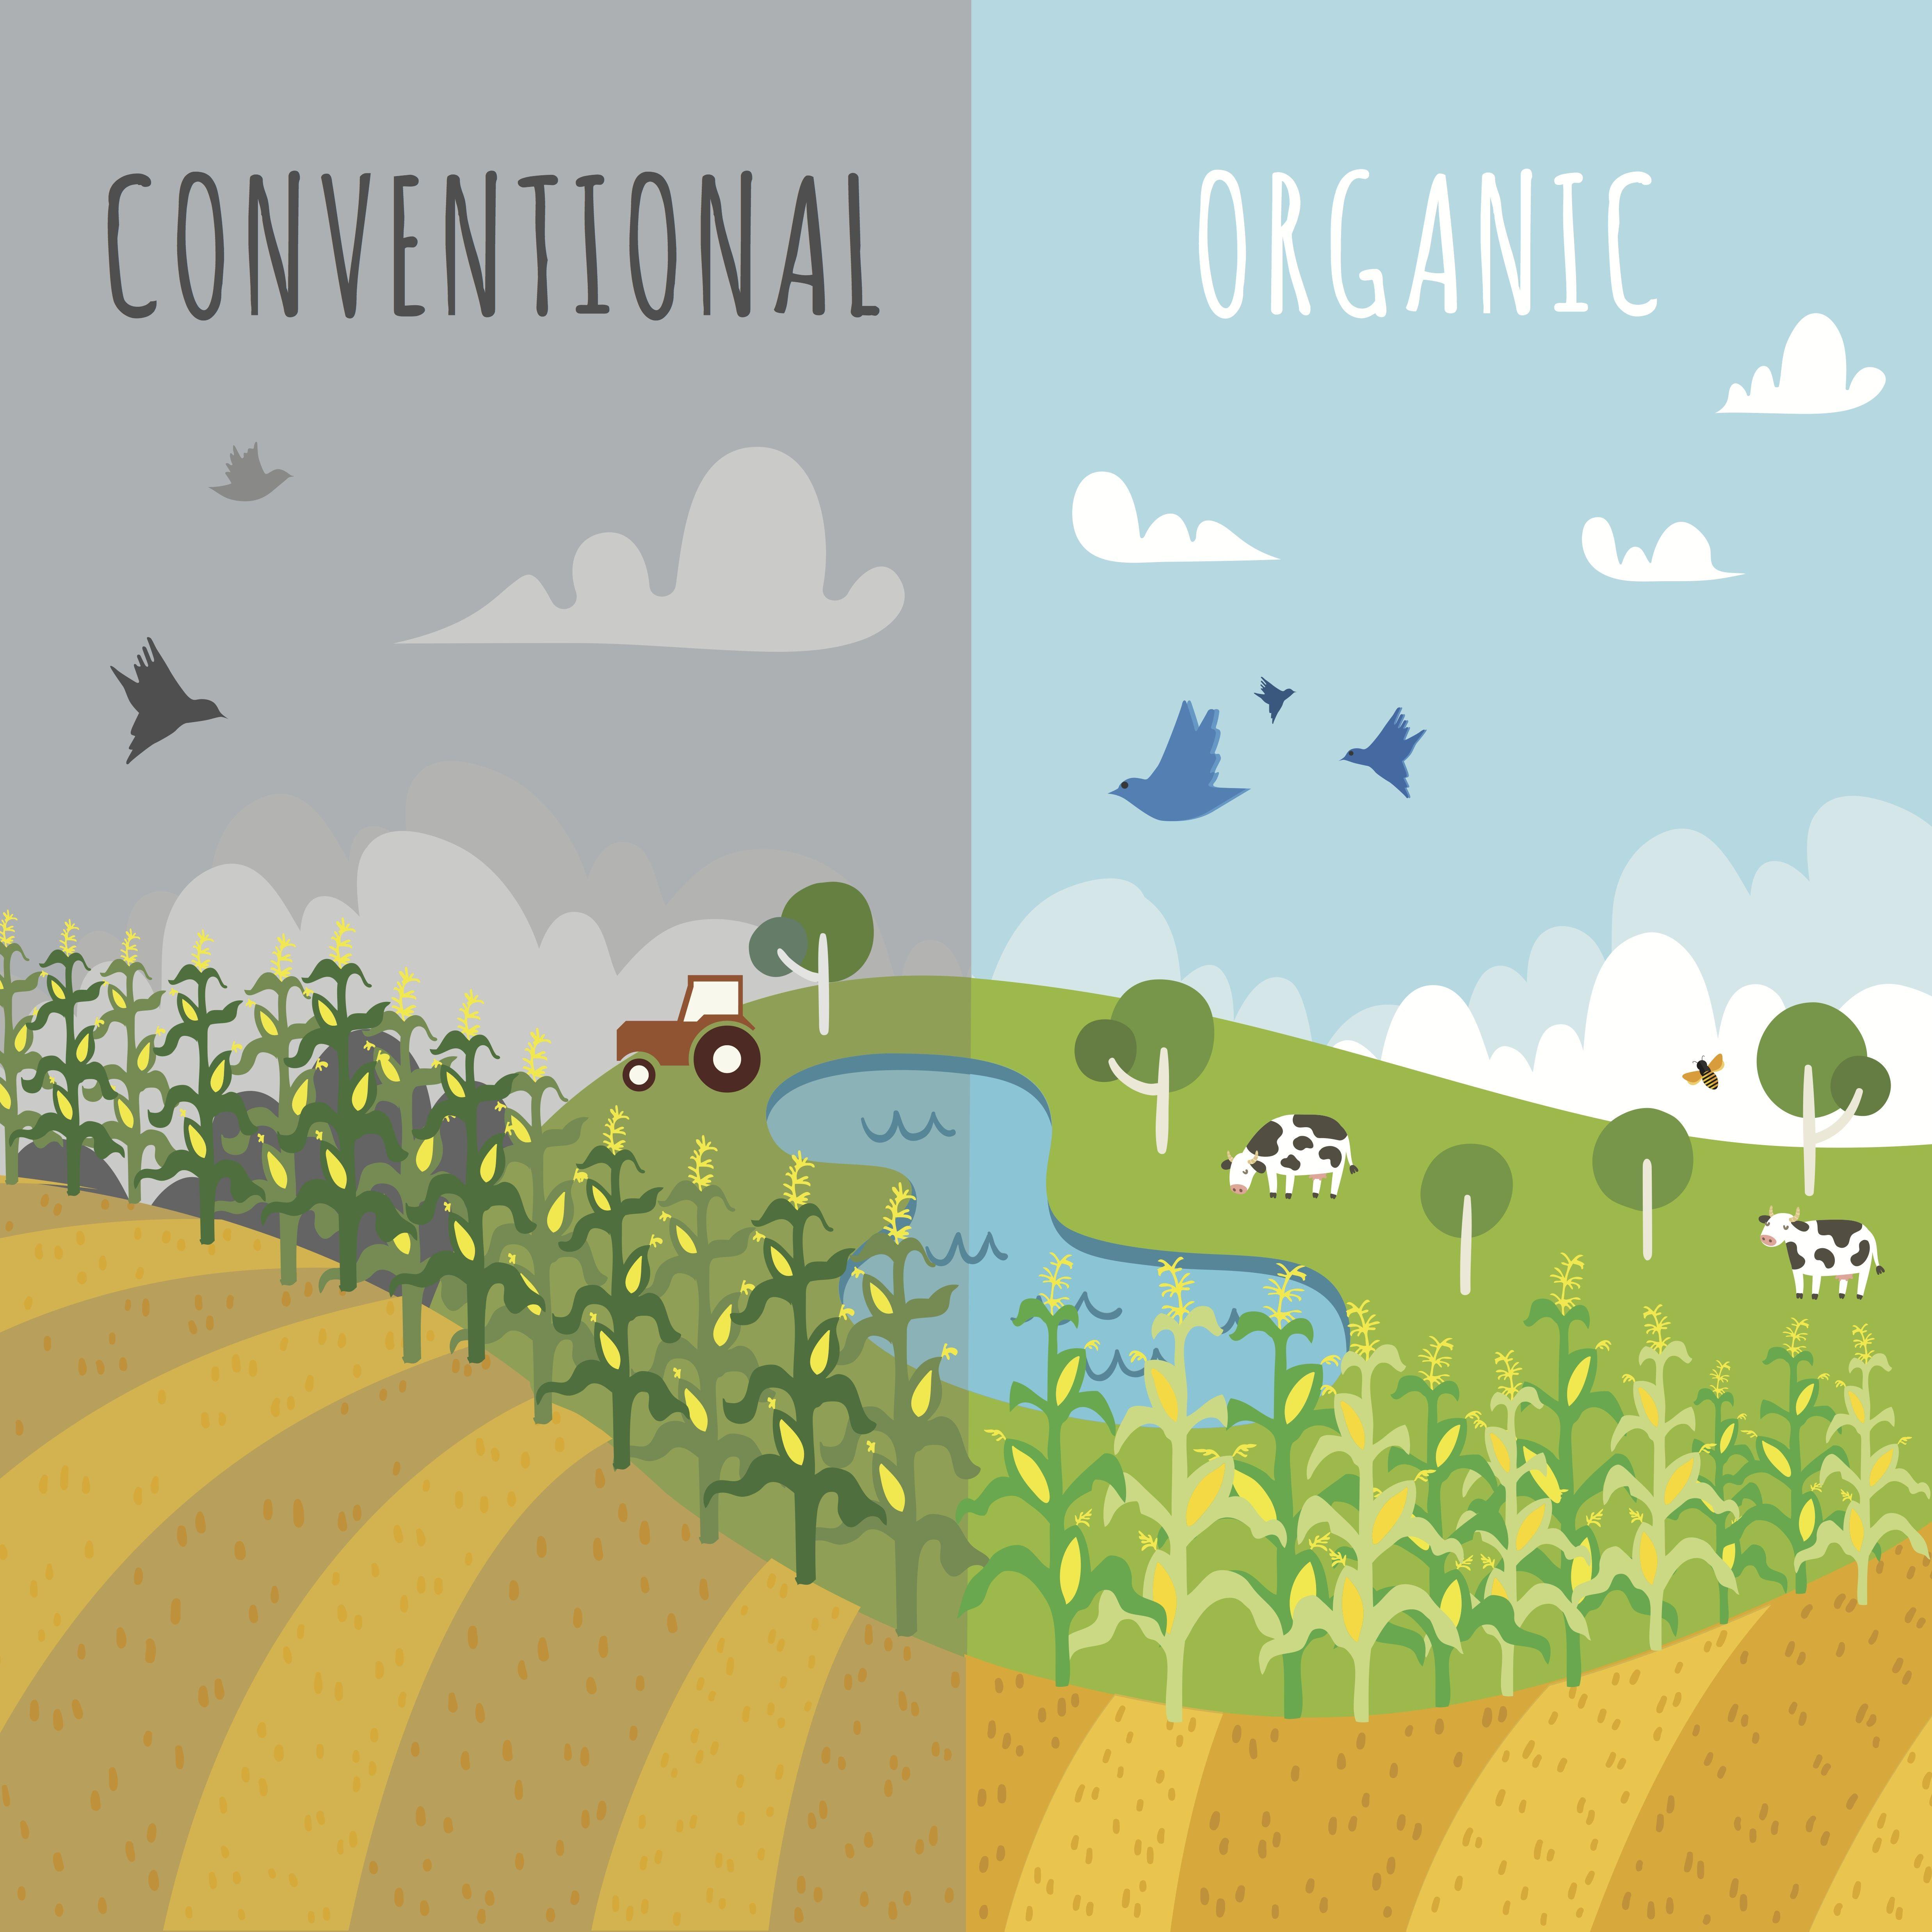 Organic Can Feed The World Organic Farming Organic Pesticide Aquaponics System